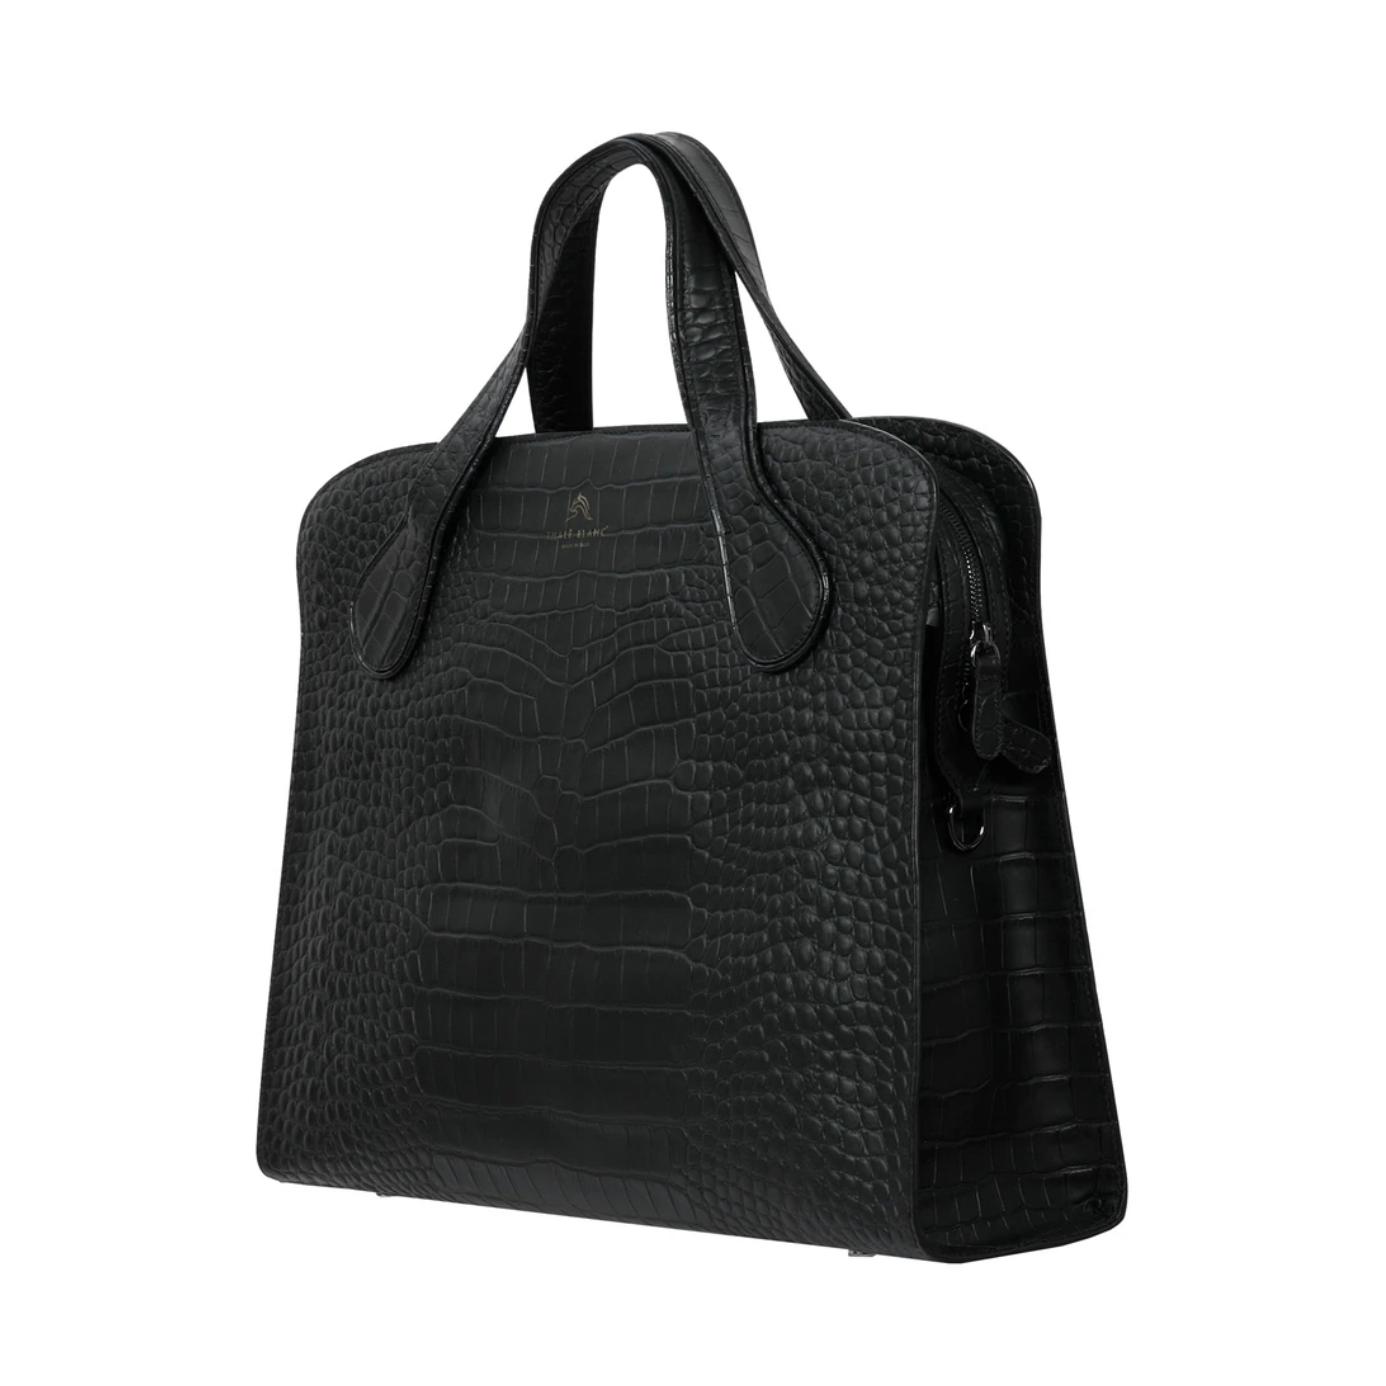 thale blanc vanessa satchel